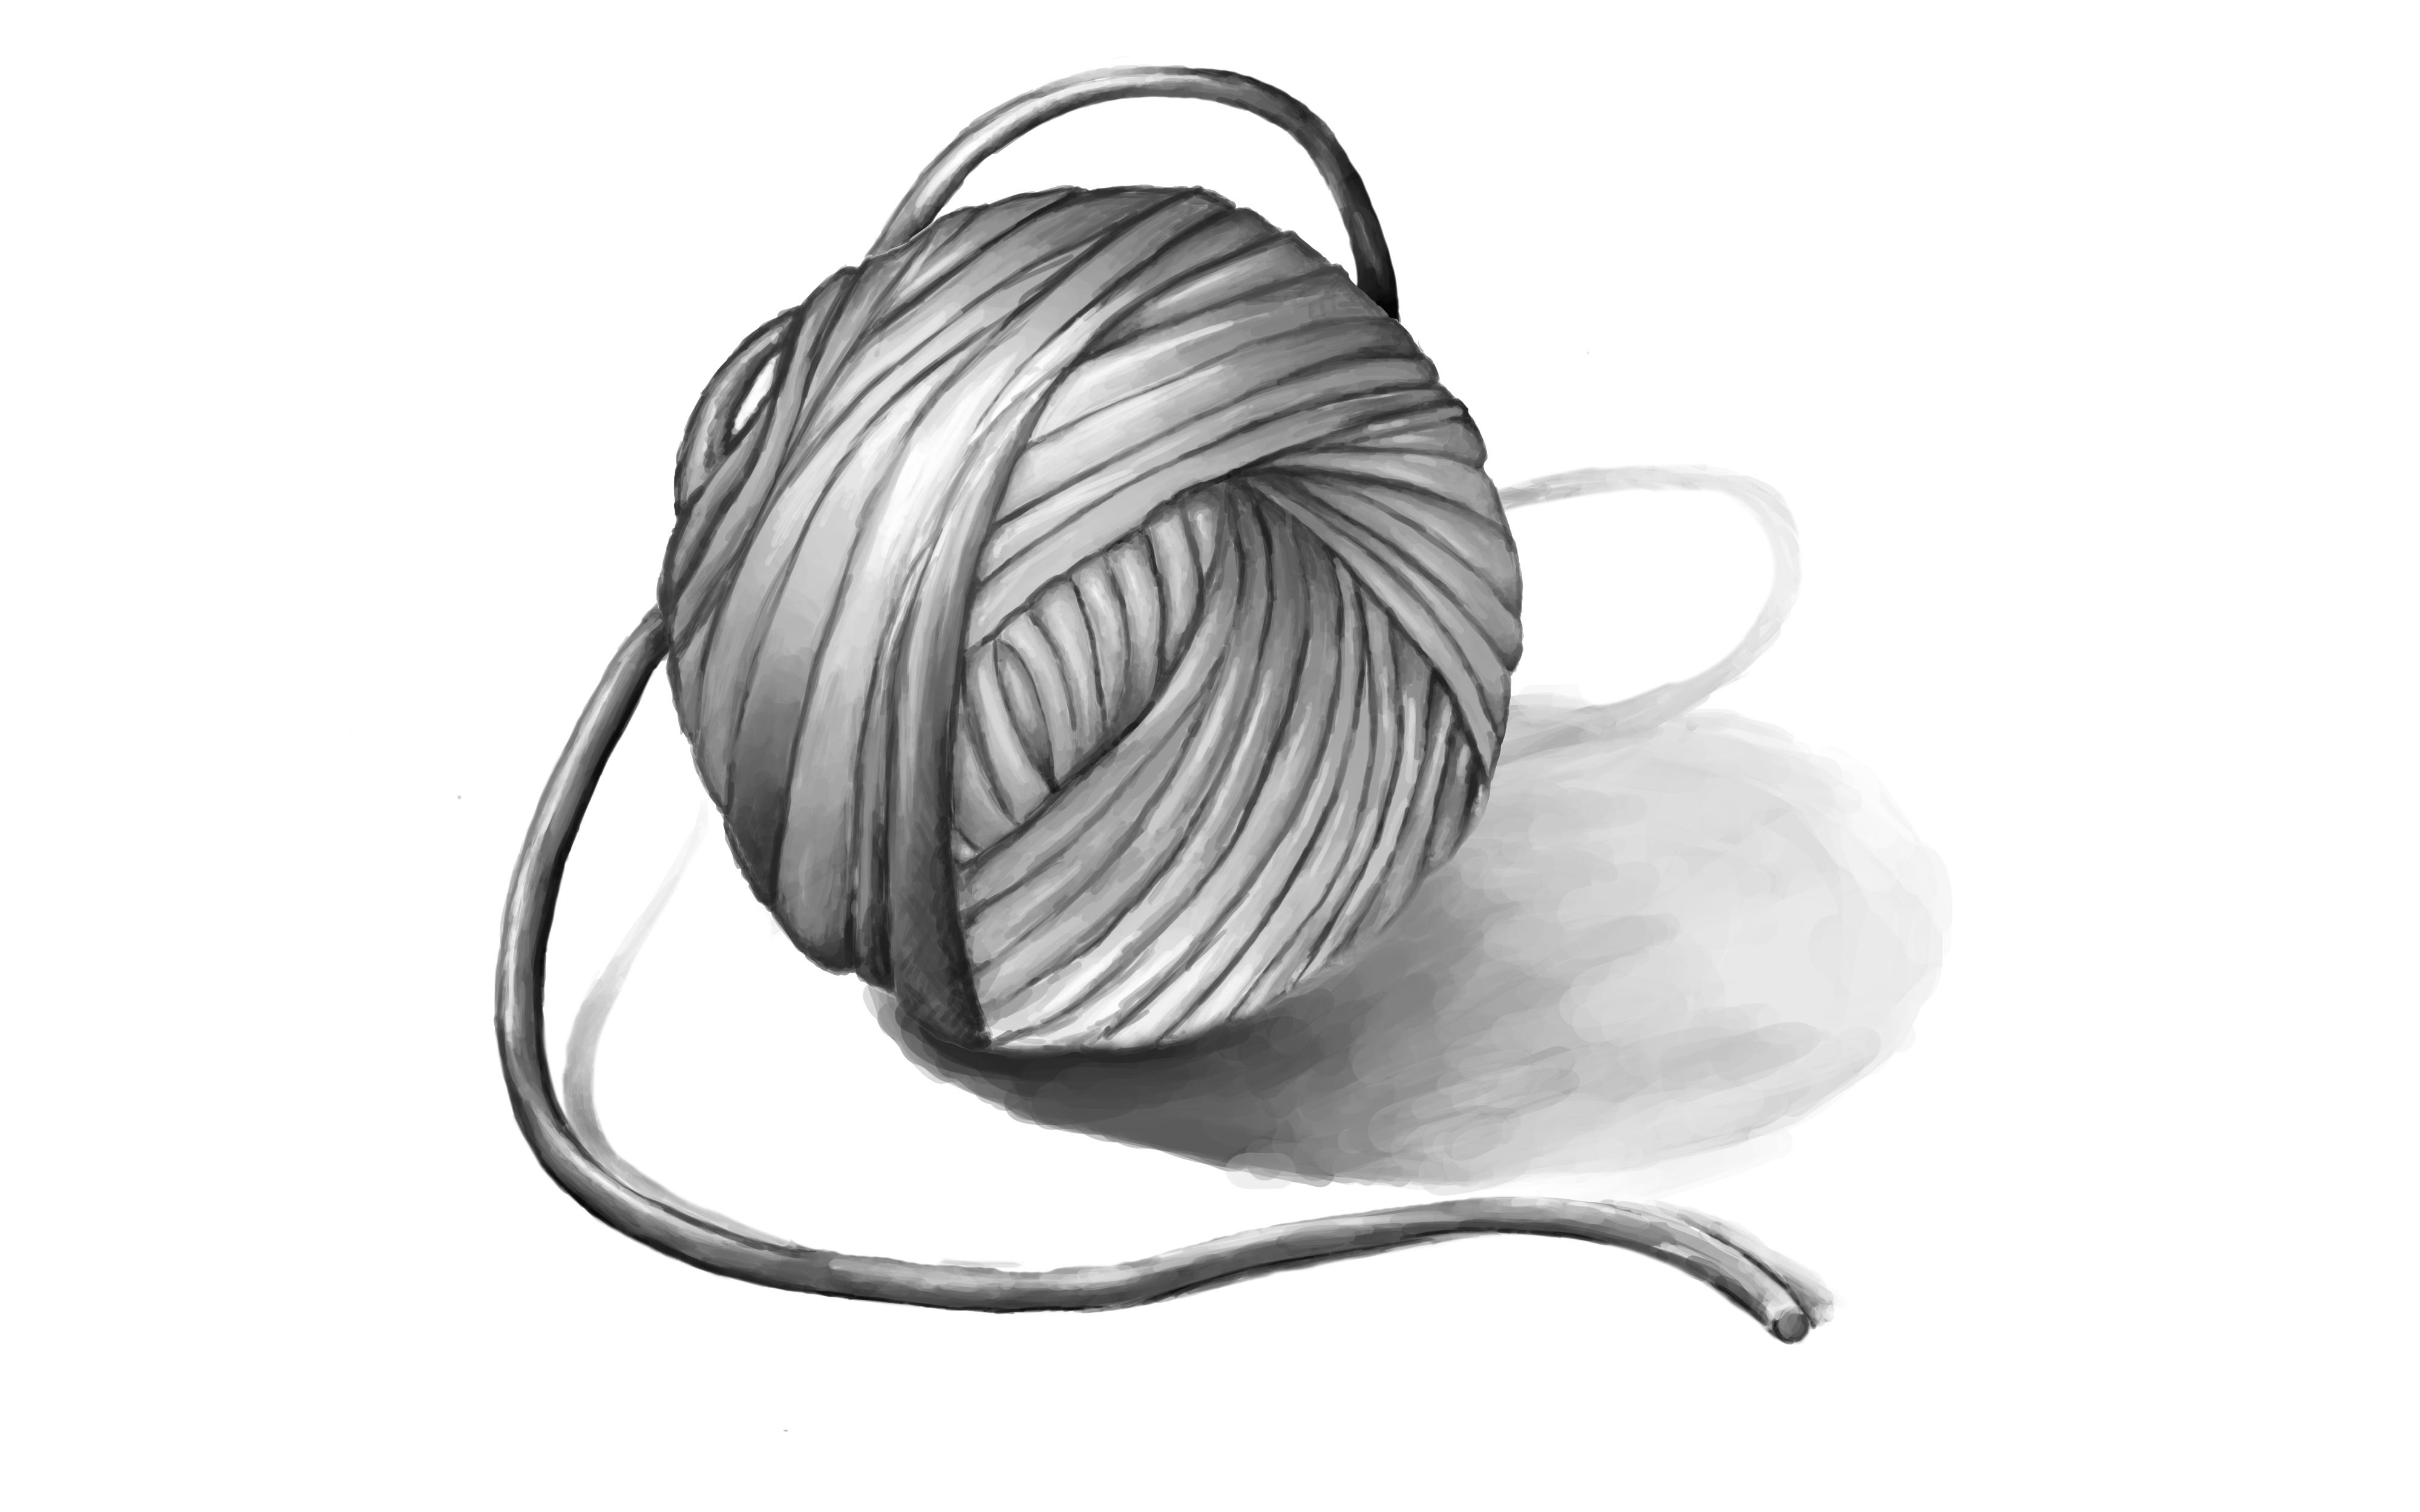 ball of yarn - photo #43